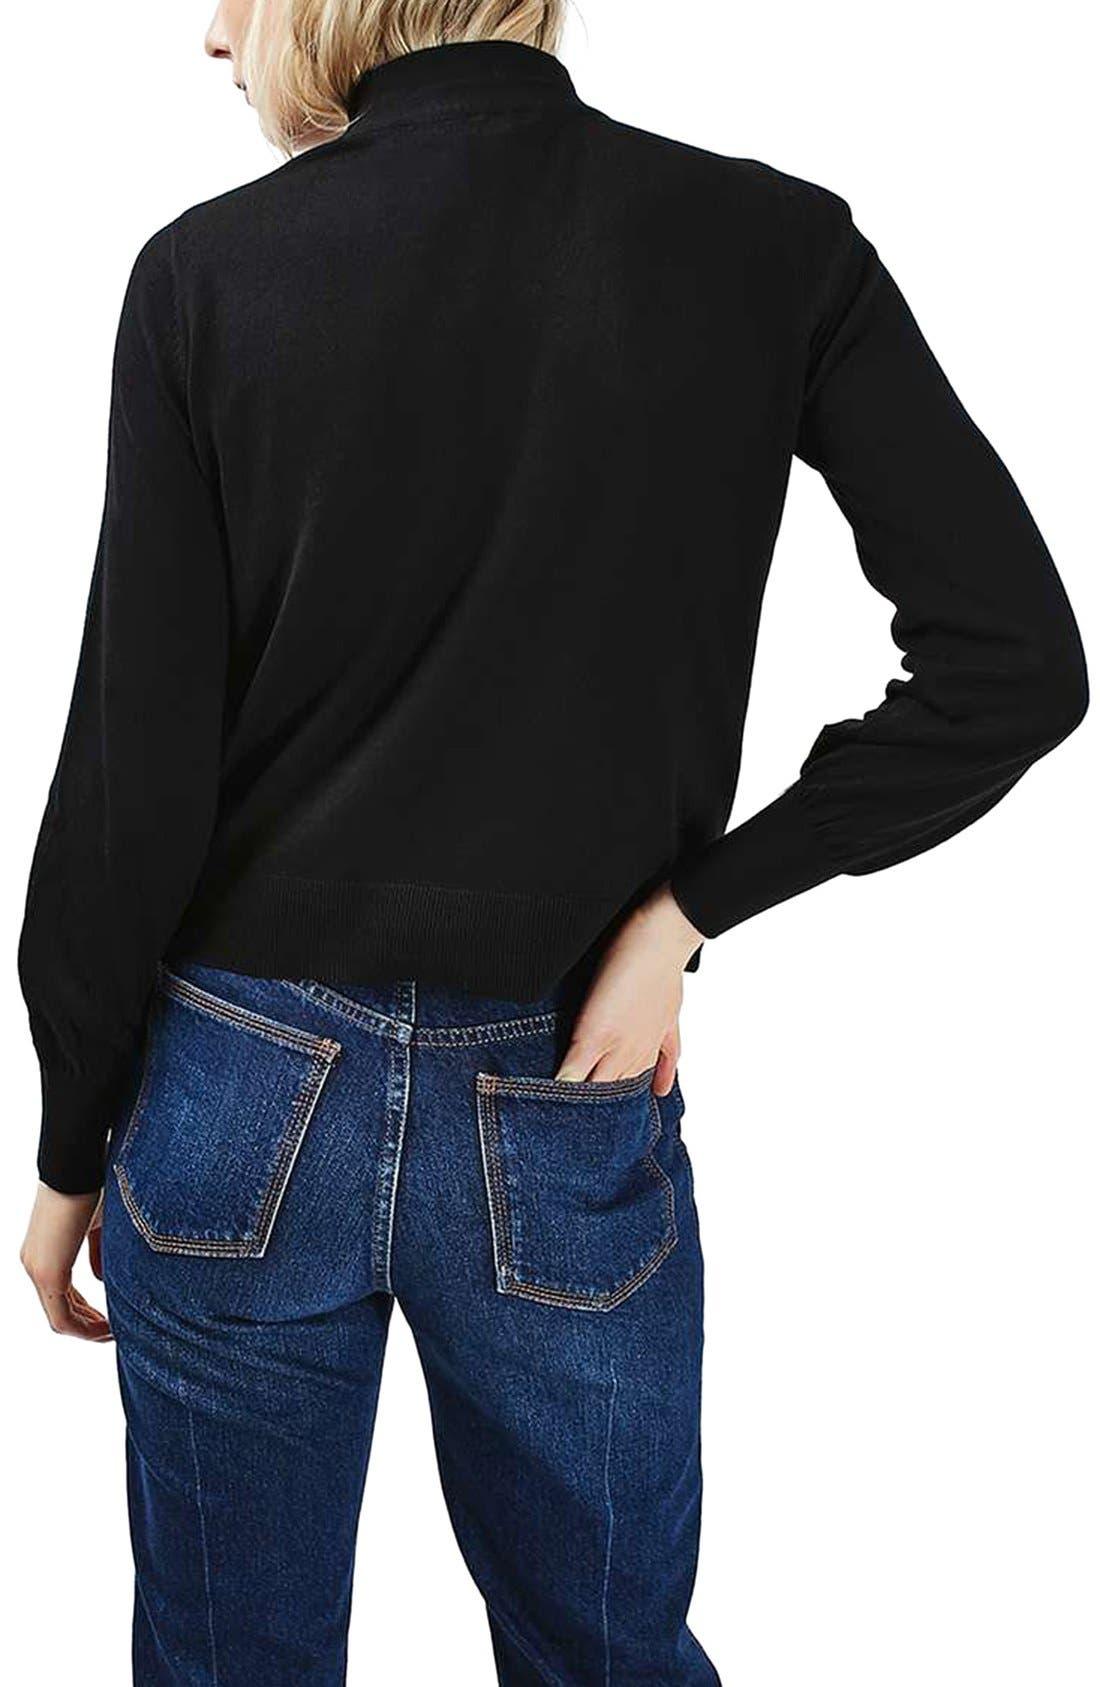 TOPSHOP, Blouson Sleeve Mock Neck Sweater, Alternate thumbnail 3, color, 001